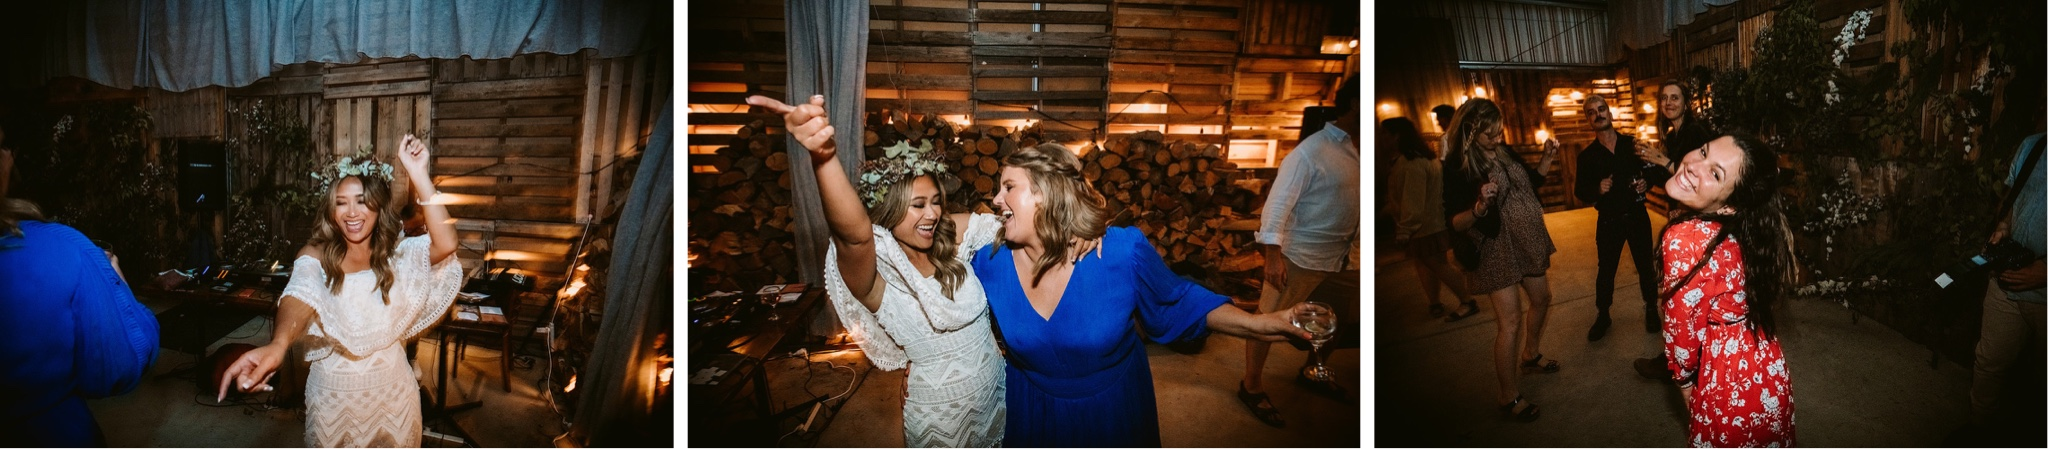 Wedstival Festival Wedding Photographer Yarra Valley160.jpg